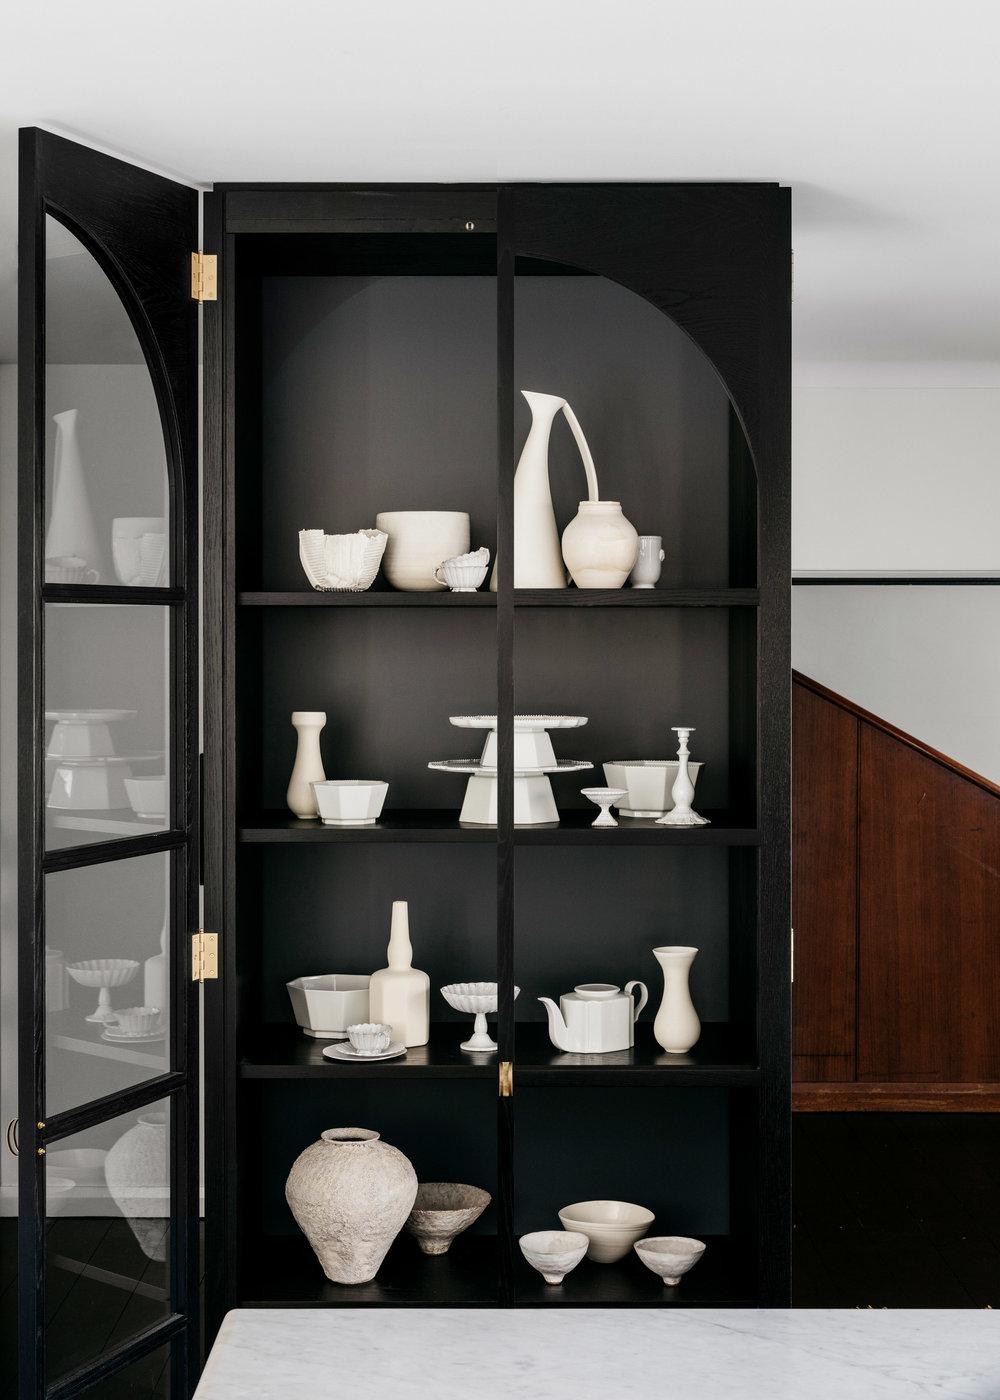 curatorial-house-arent-pyke-interiors-residential-australia-sydney_dezeen_2364_col_4.jpg